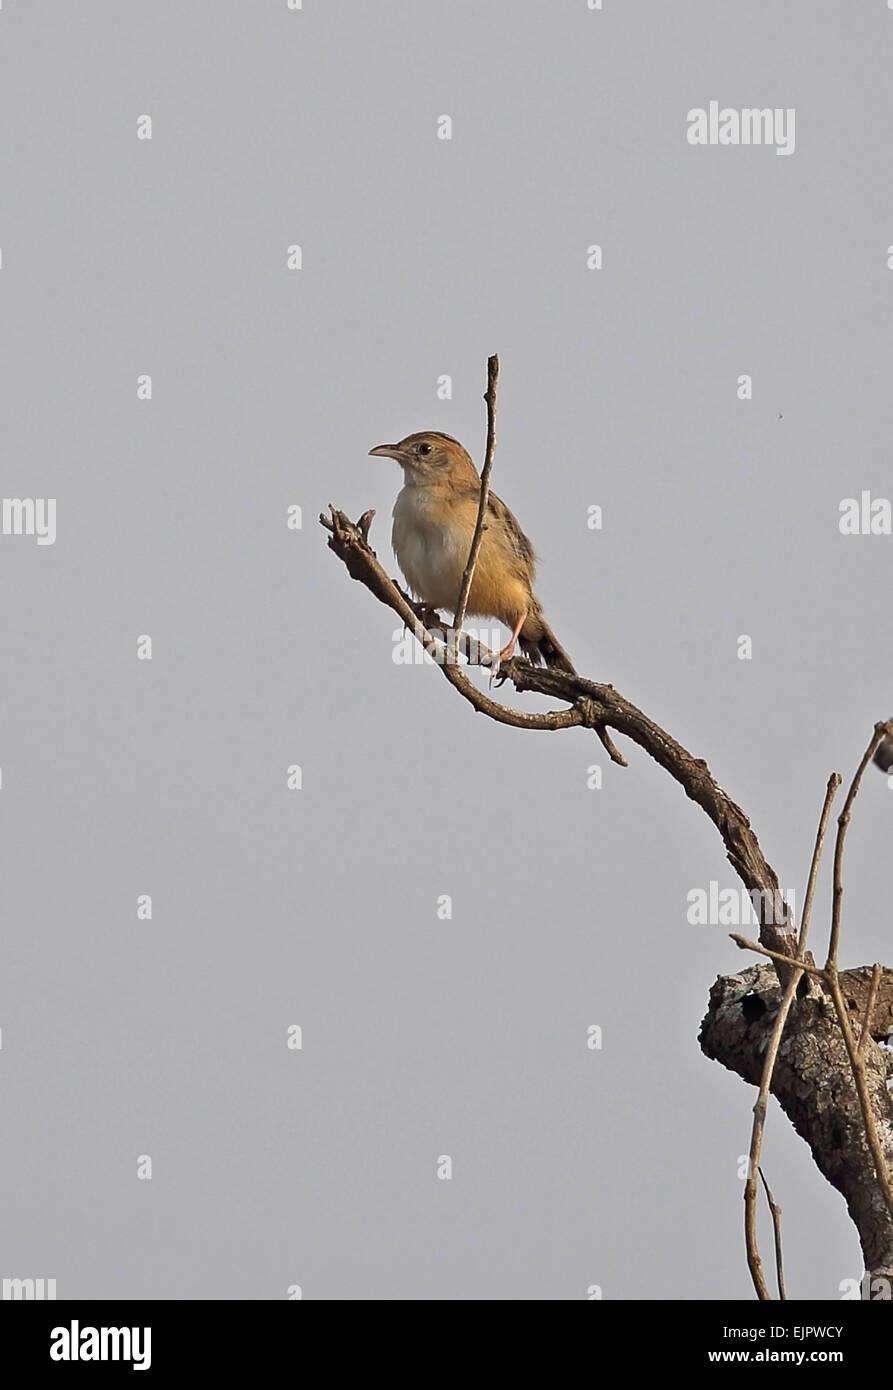 Short-winged Cisticola (Cisticola brachypterus brachypterus) adult, perched at top of dead tree, Shai Hills, Greater - Stock Image